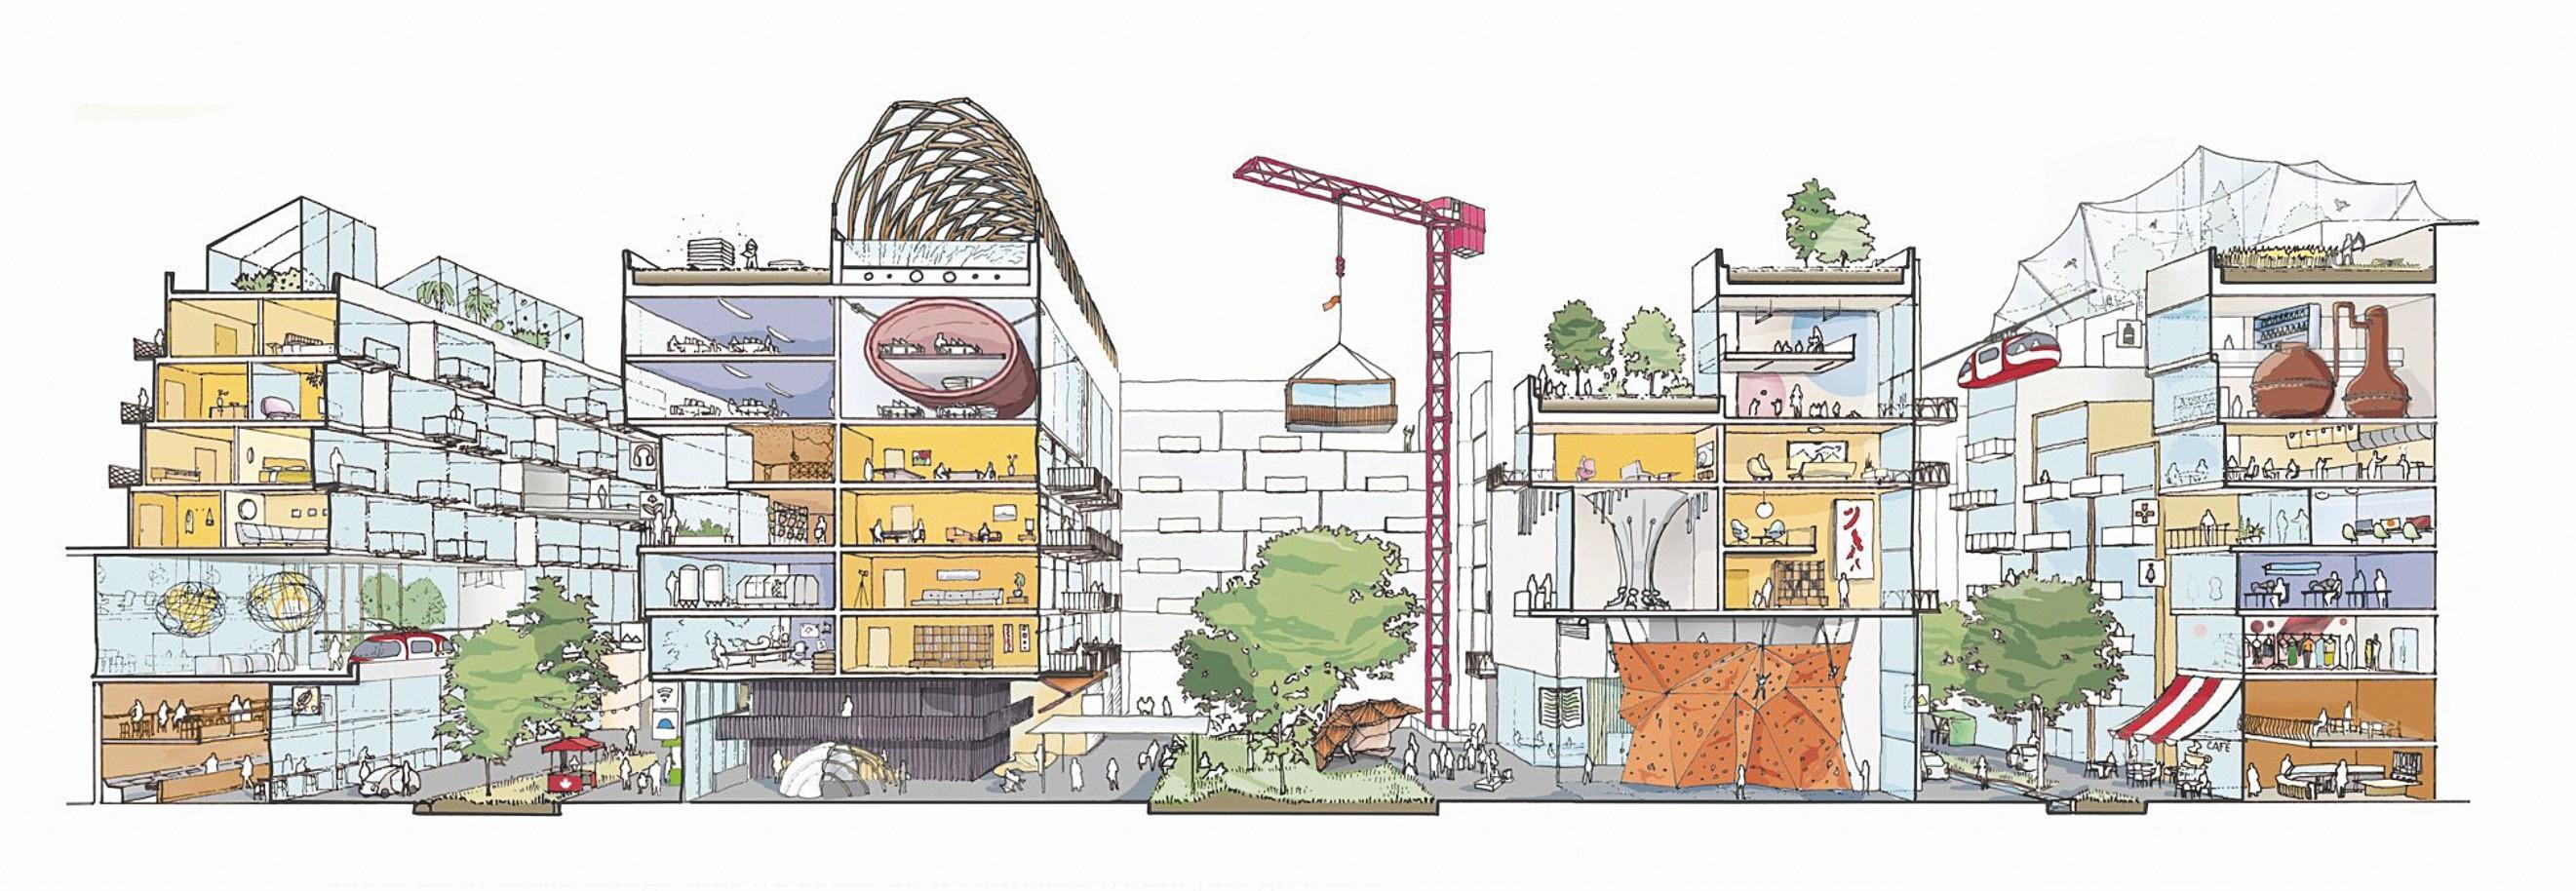 city future